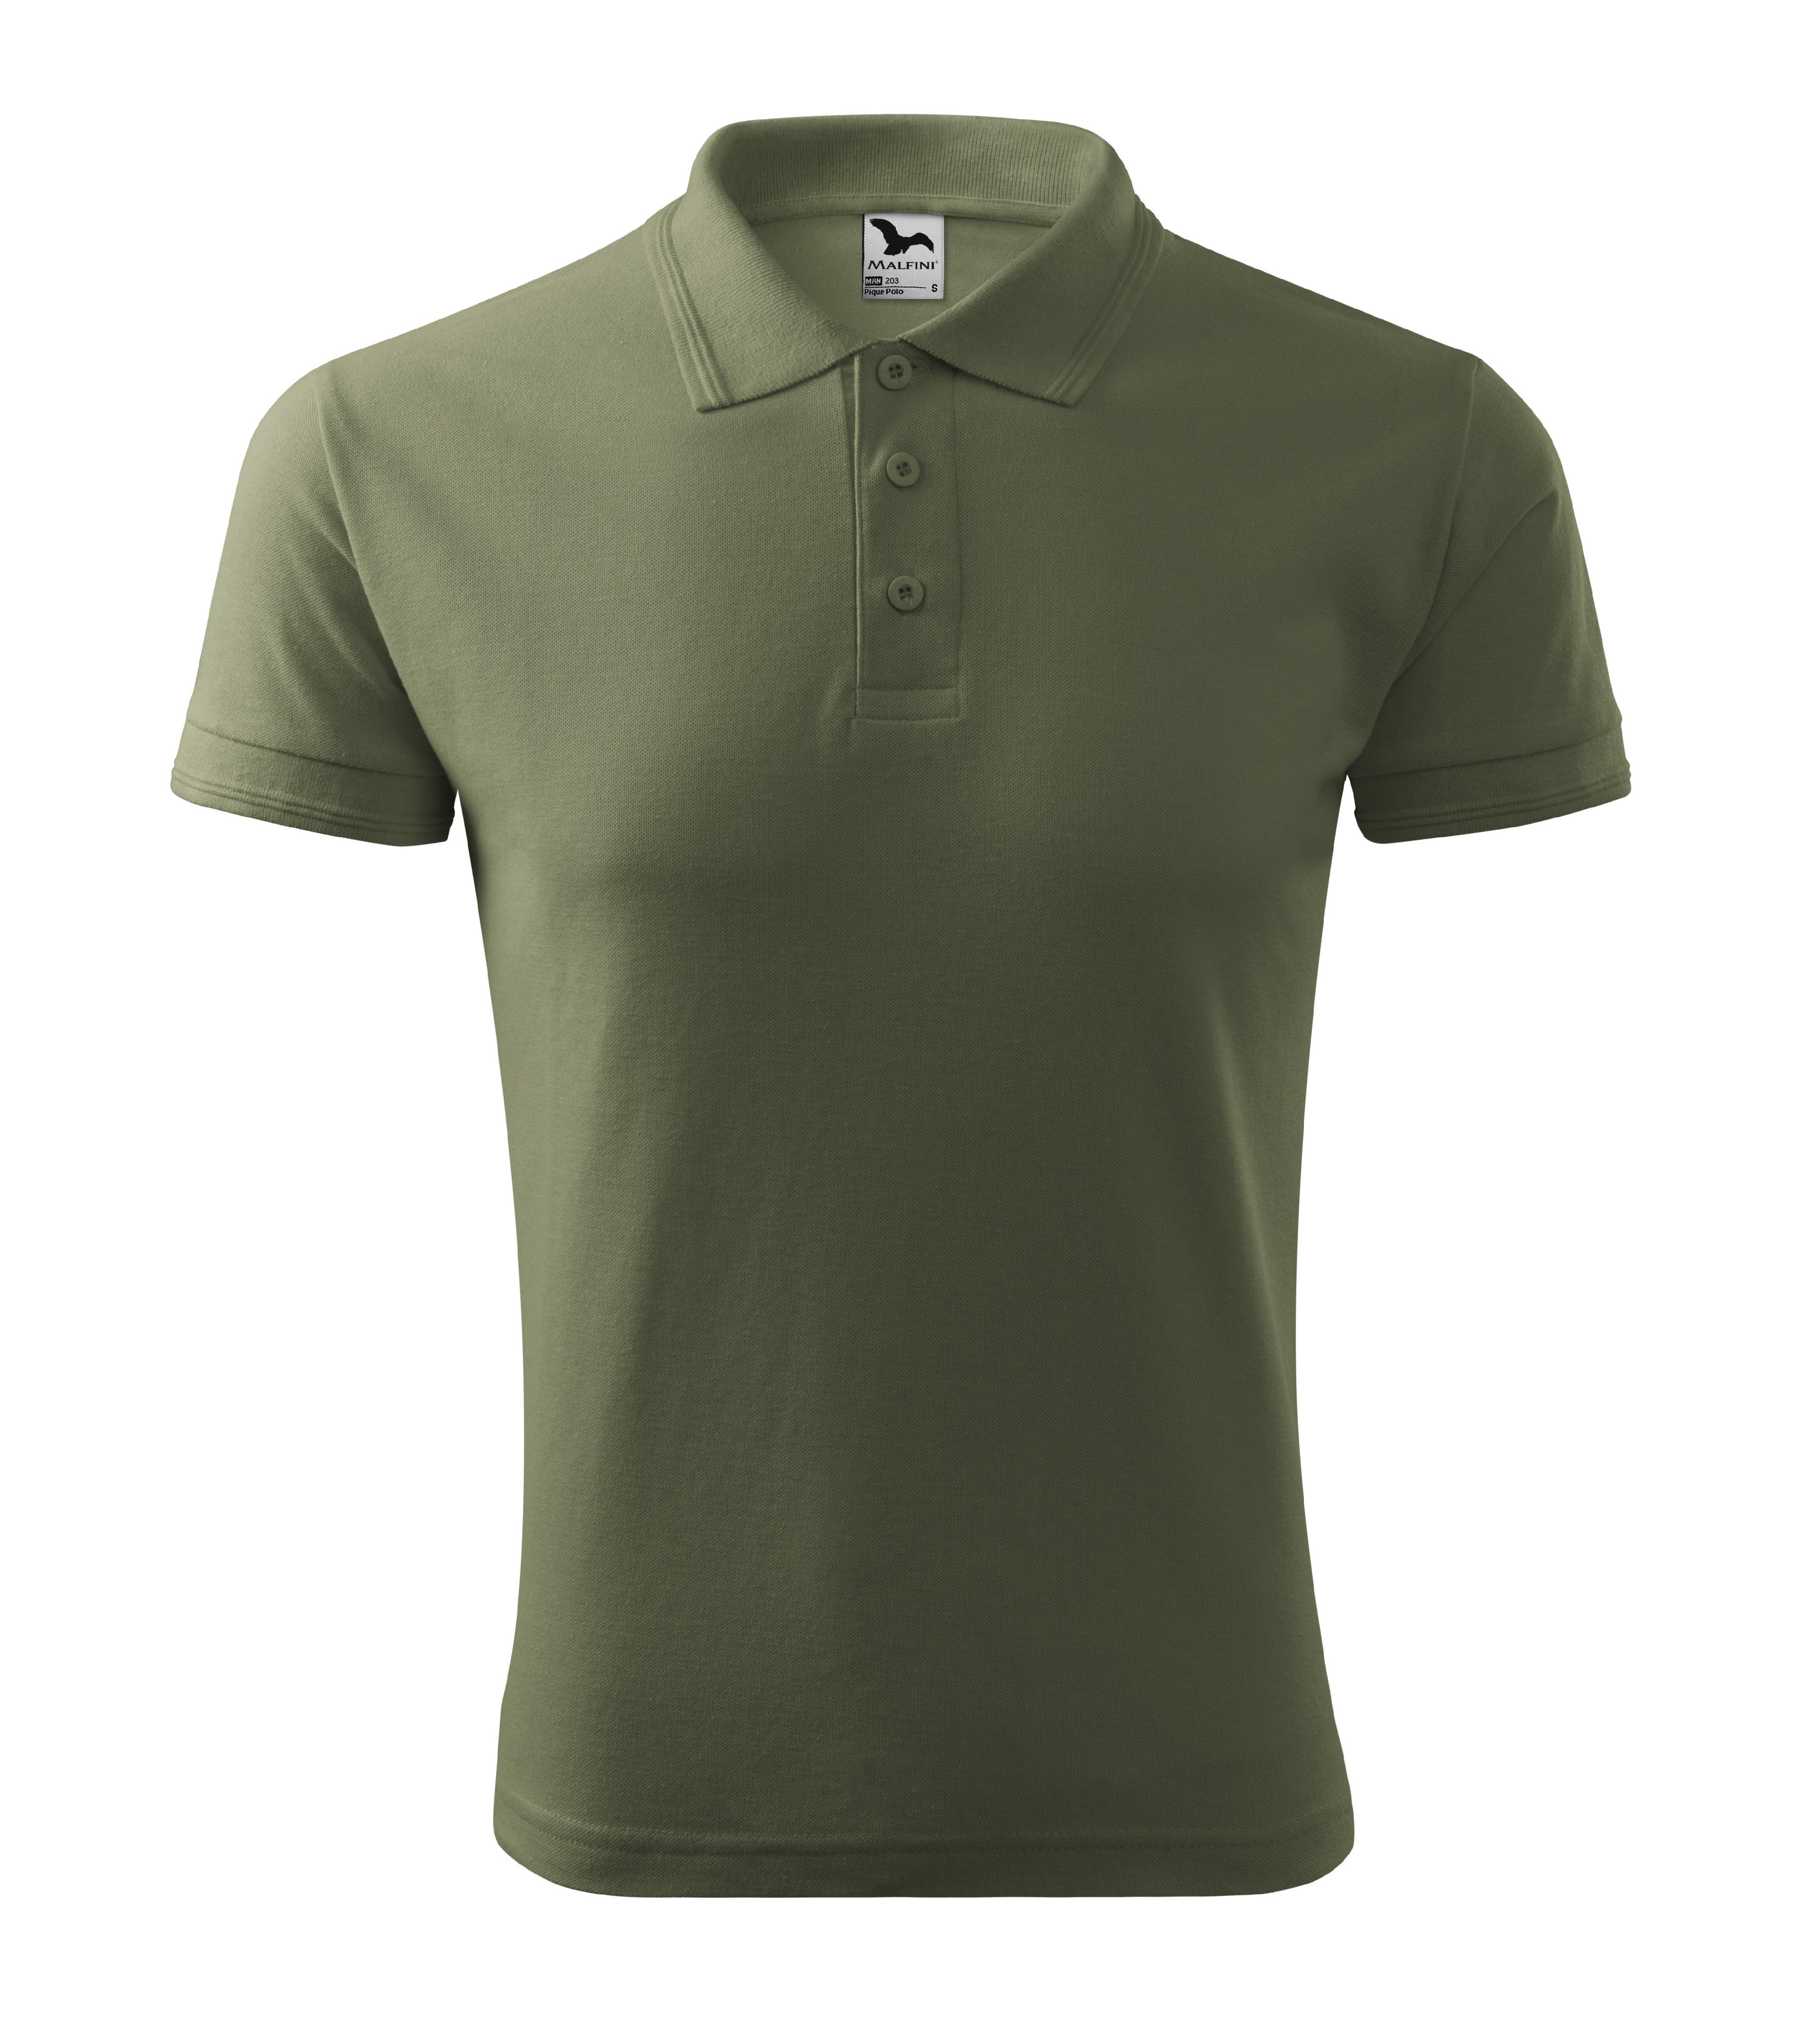 Polokošile pánská Pique Polo Barva: khaki, Velikost: L